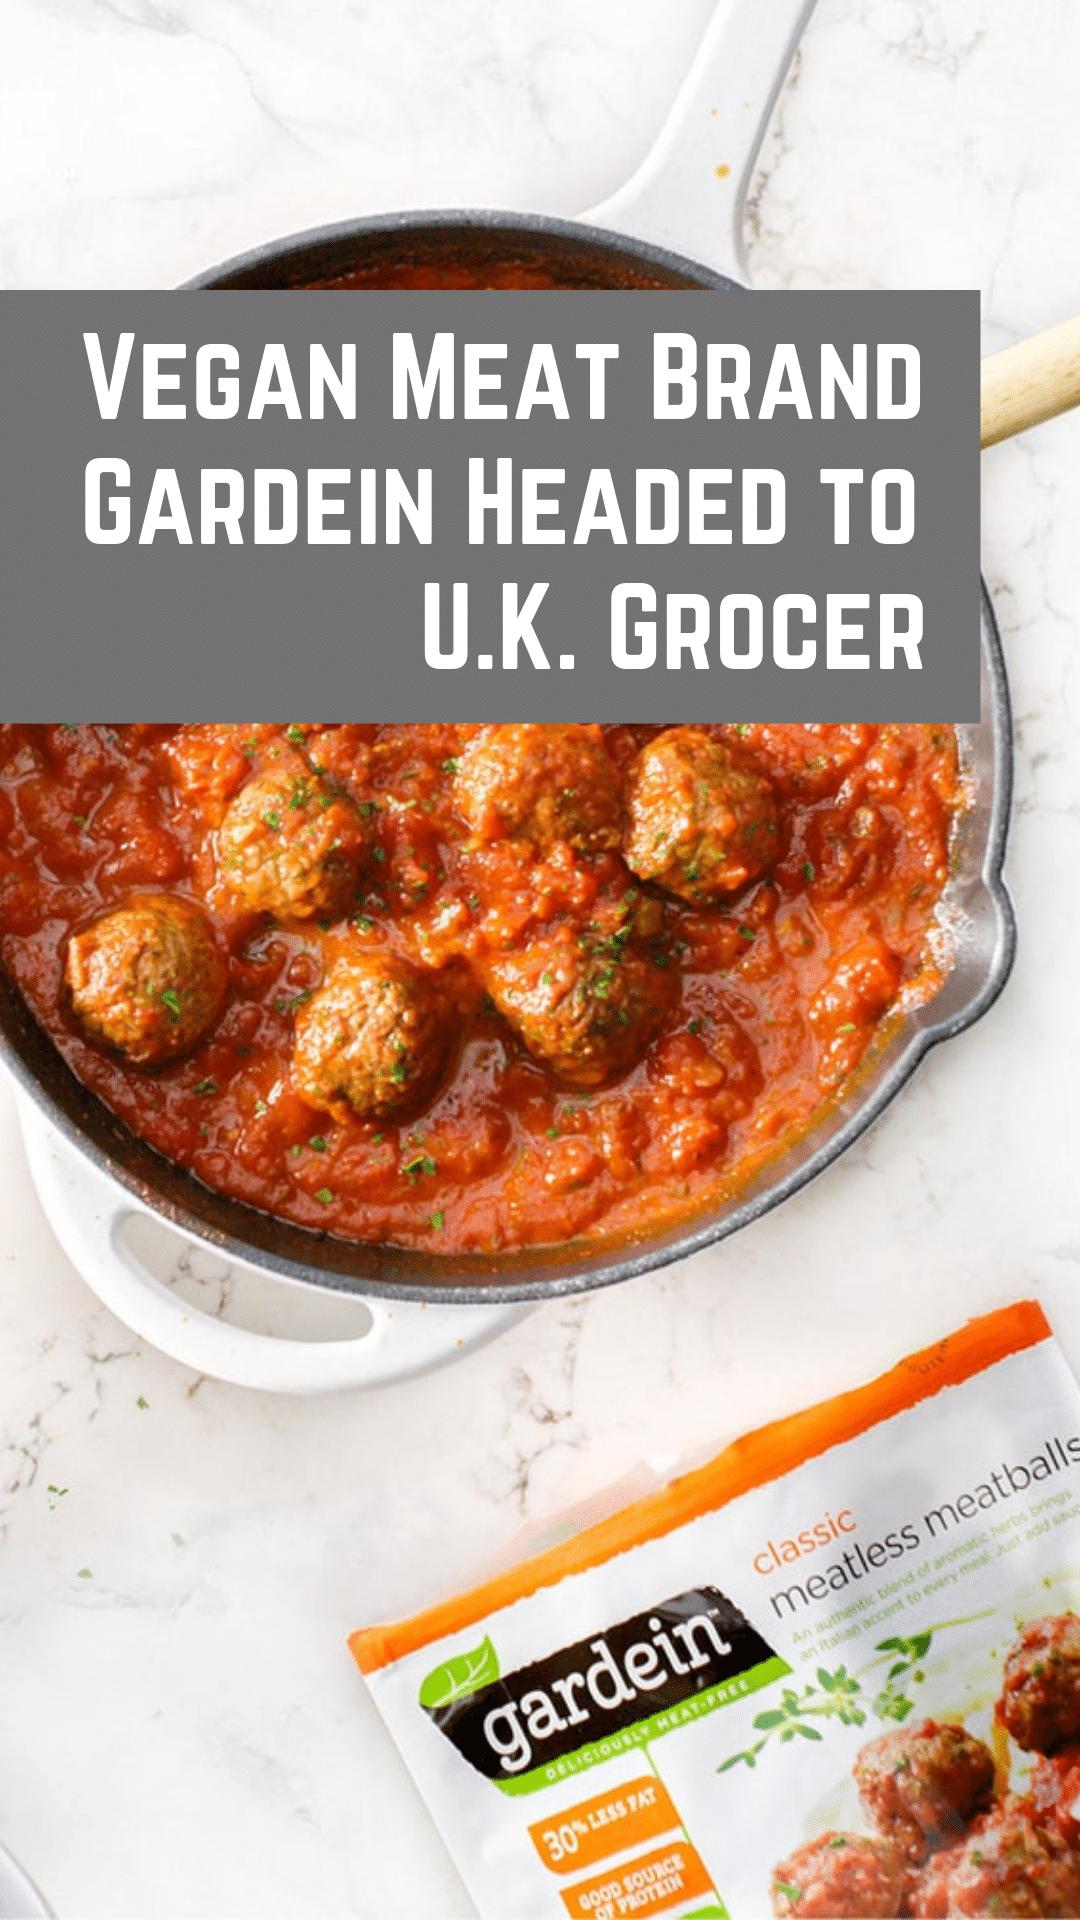 Vegan Meat Brand Gardein Headed to U.K. Grocer in 2019